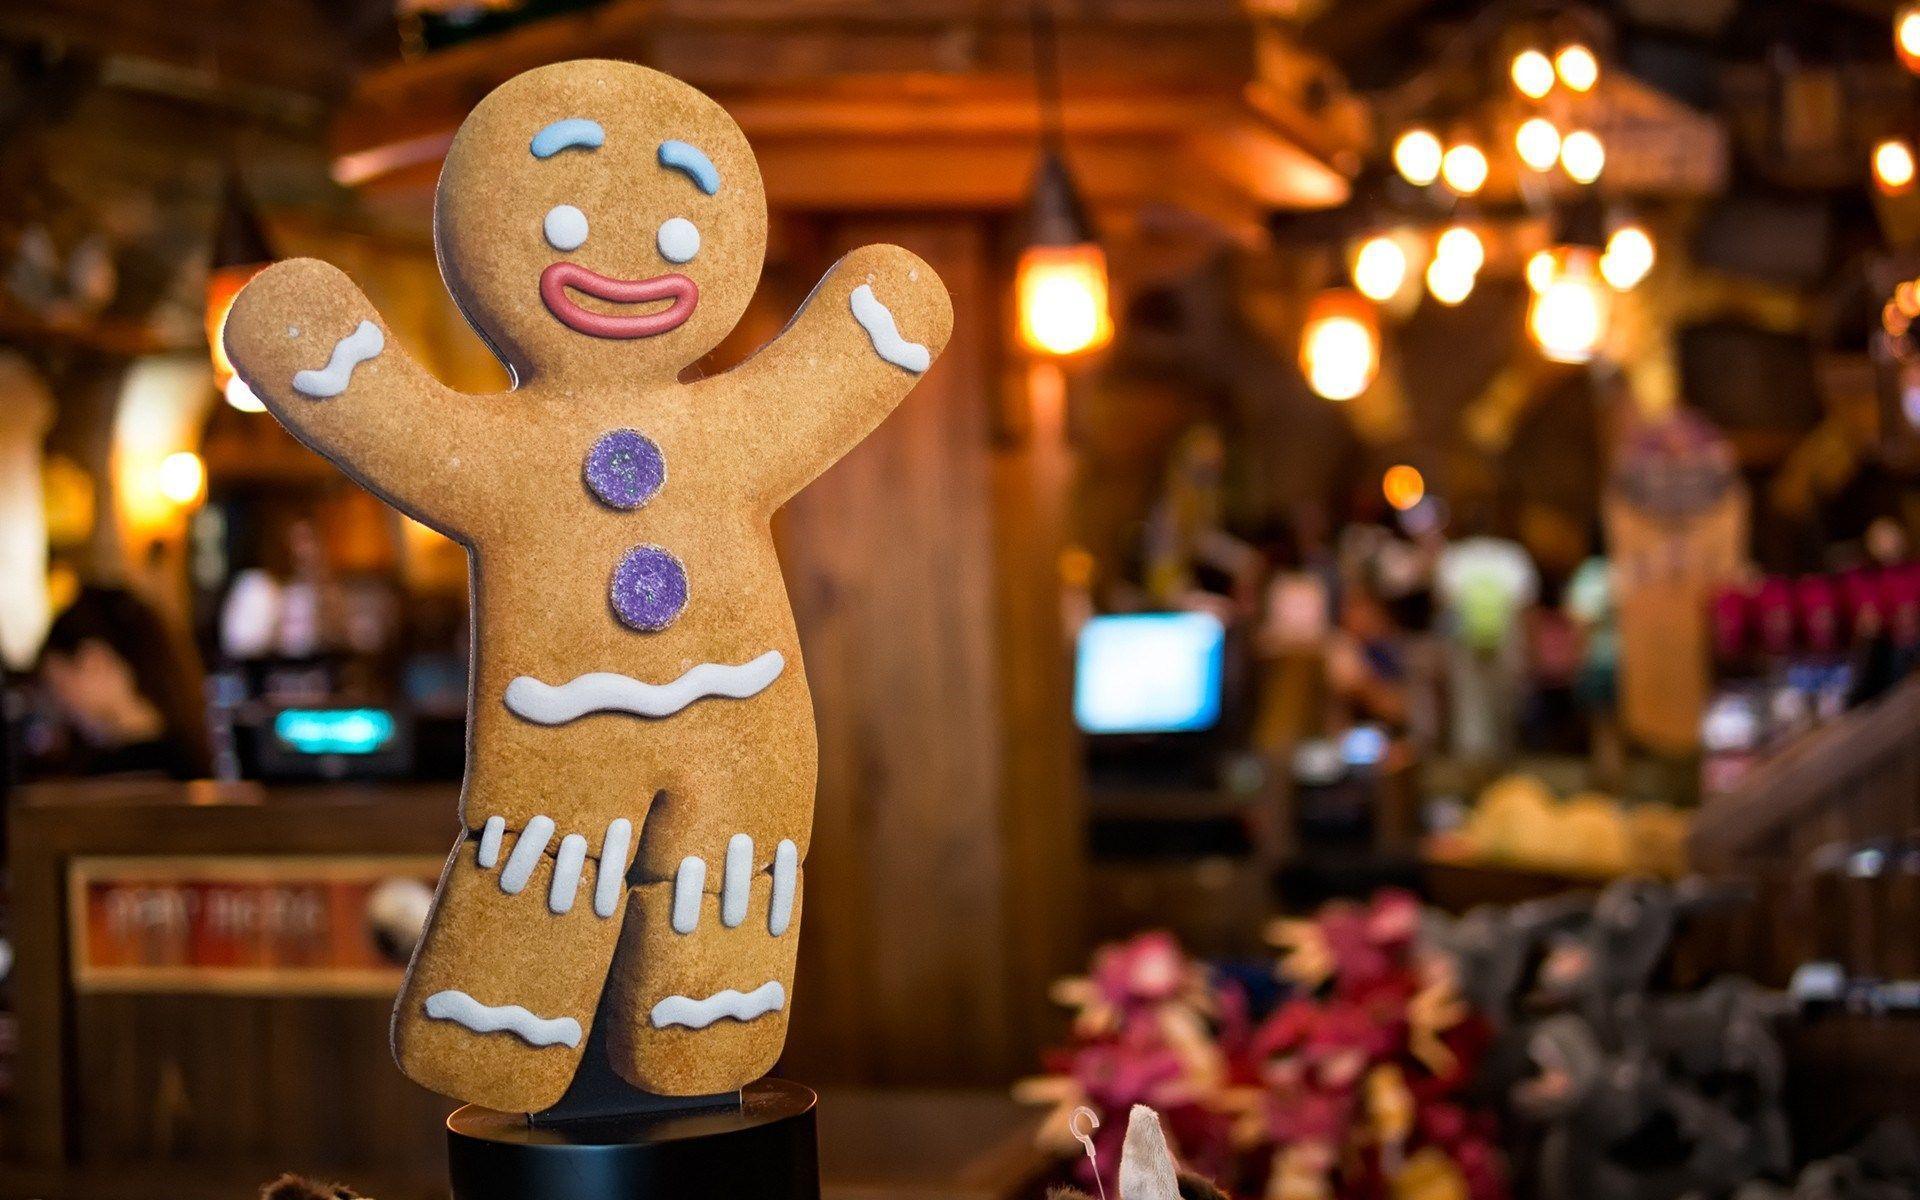 Gingerbread Man Biscuit Cookie Christmas HD Wallpaper